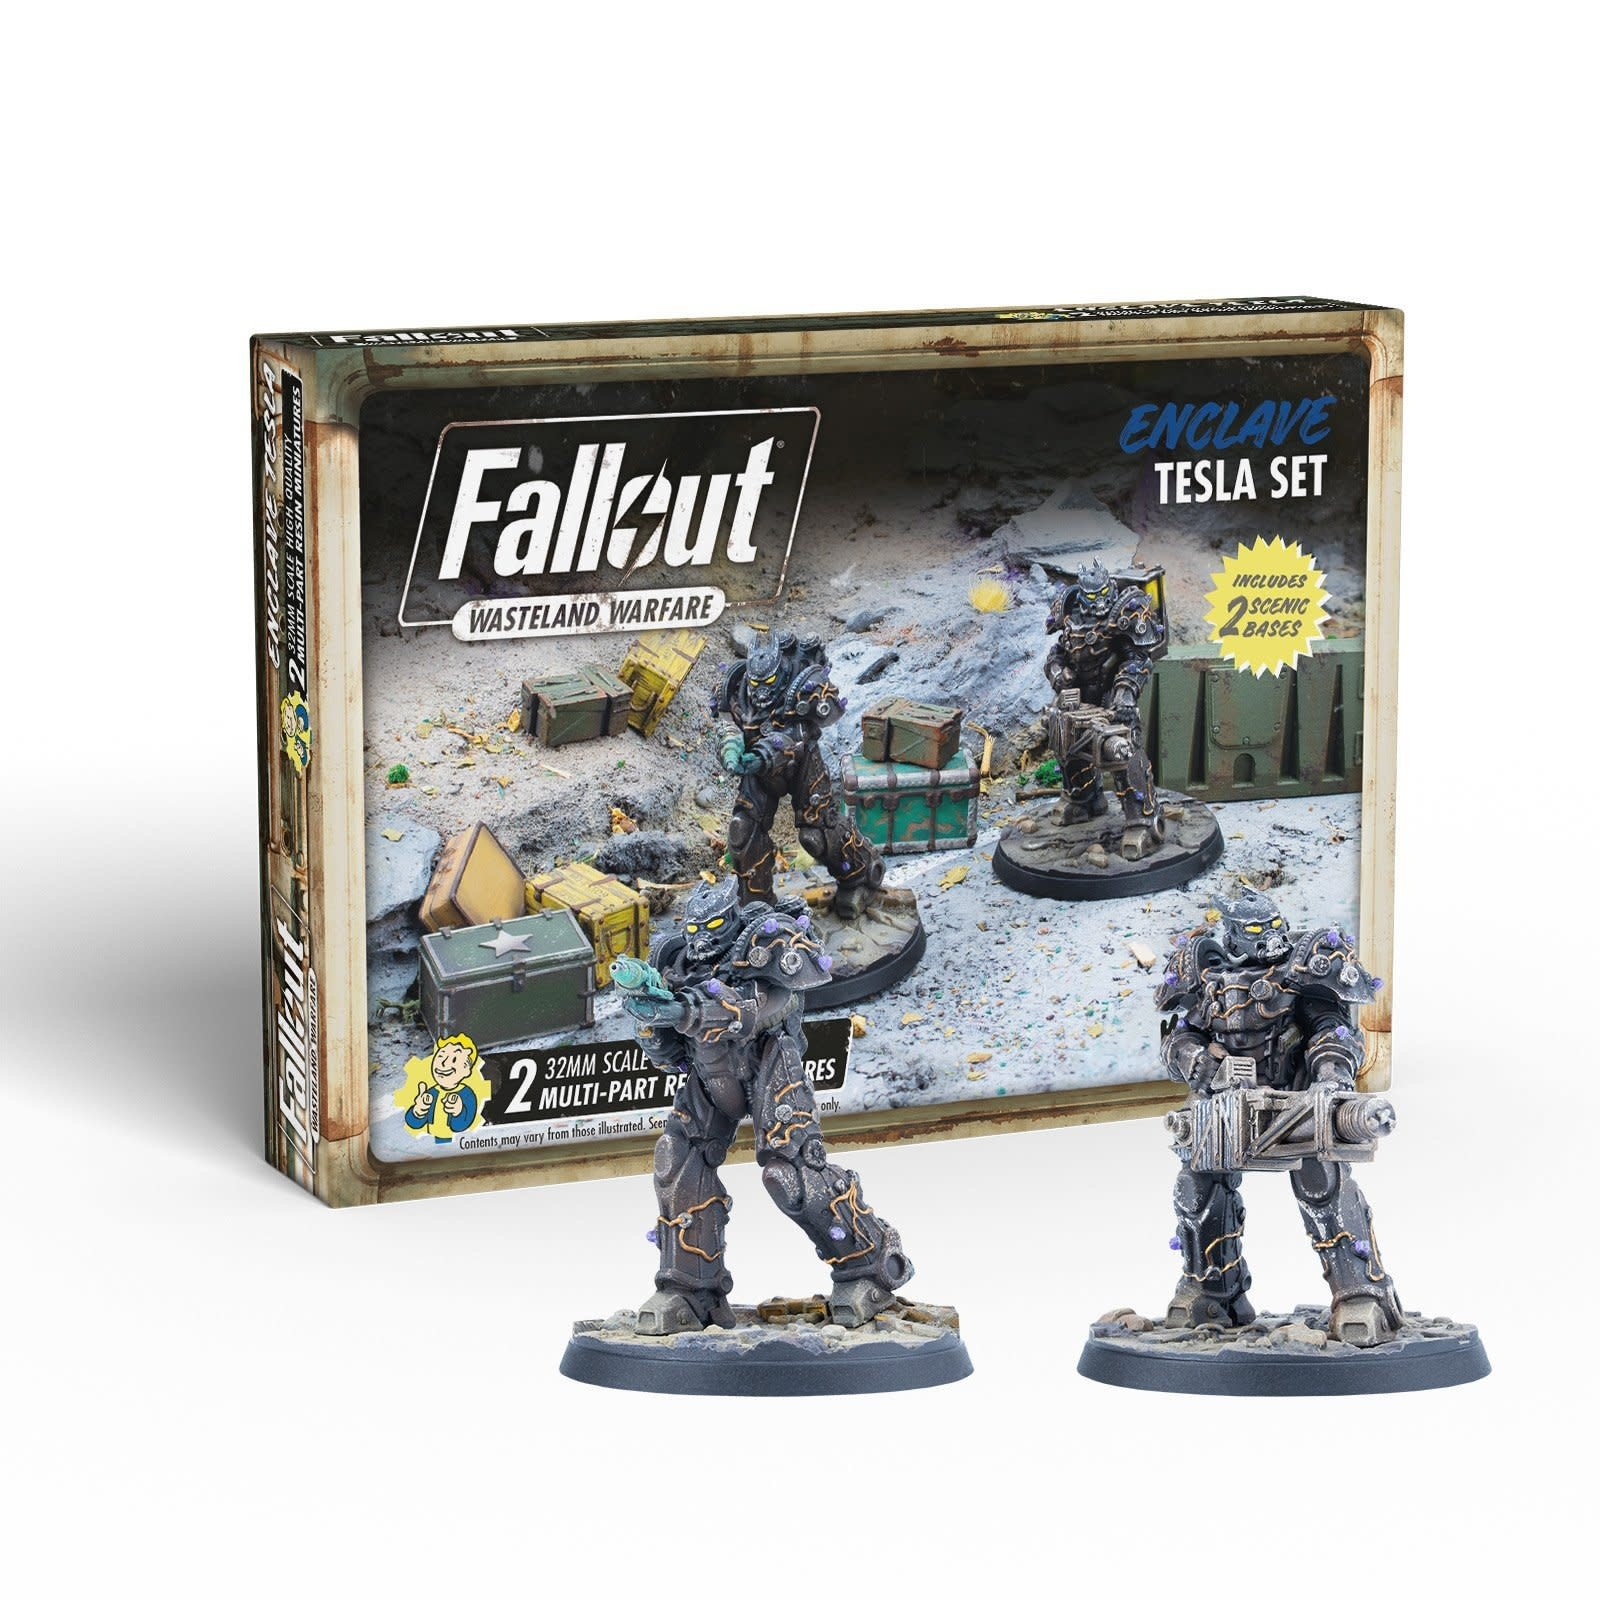 Modiphius Fallout Wasteland Warfare: Enclave- Tesla